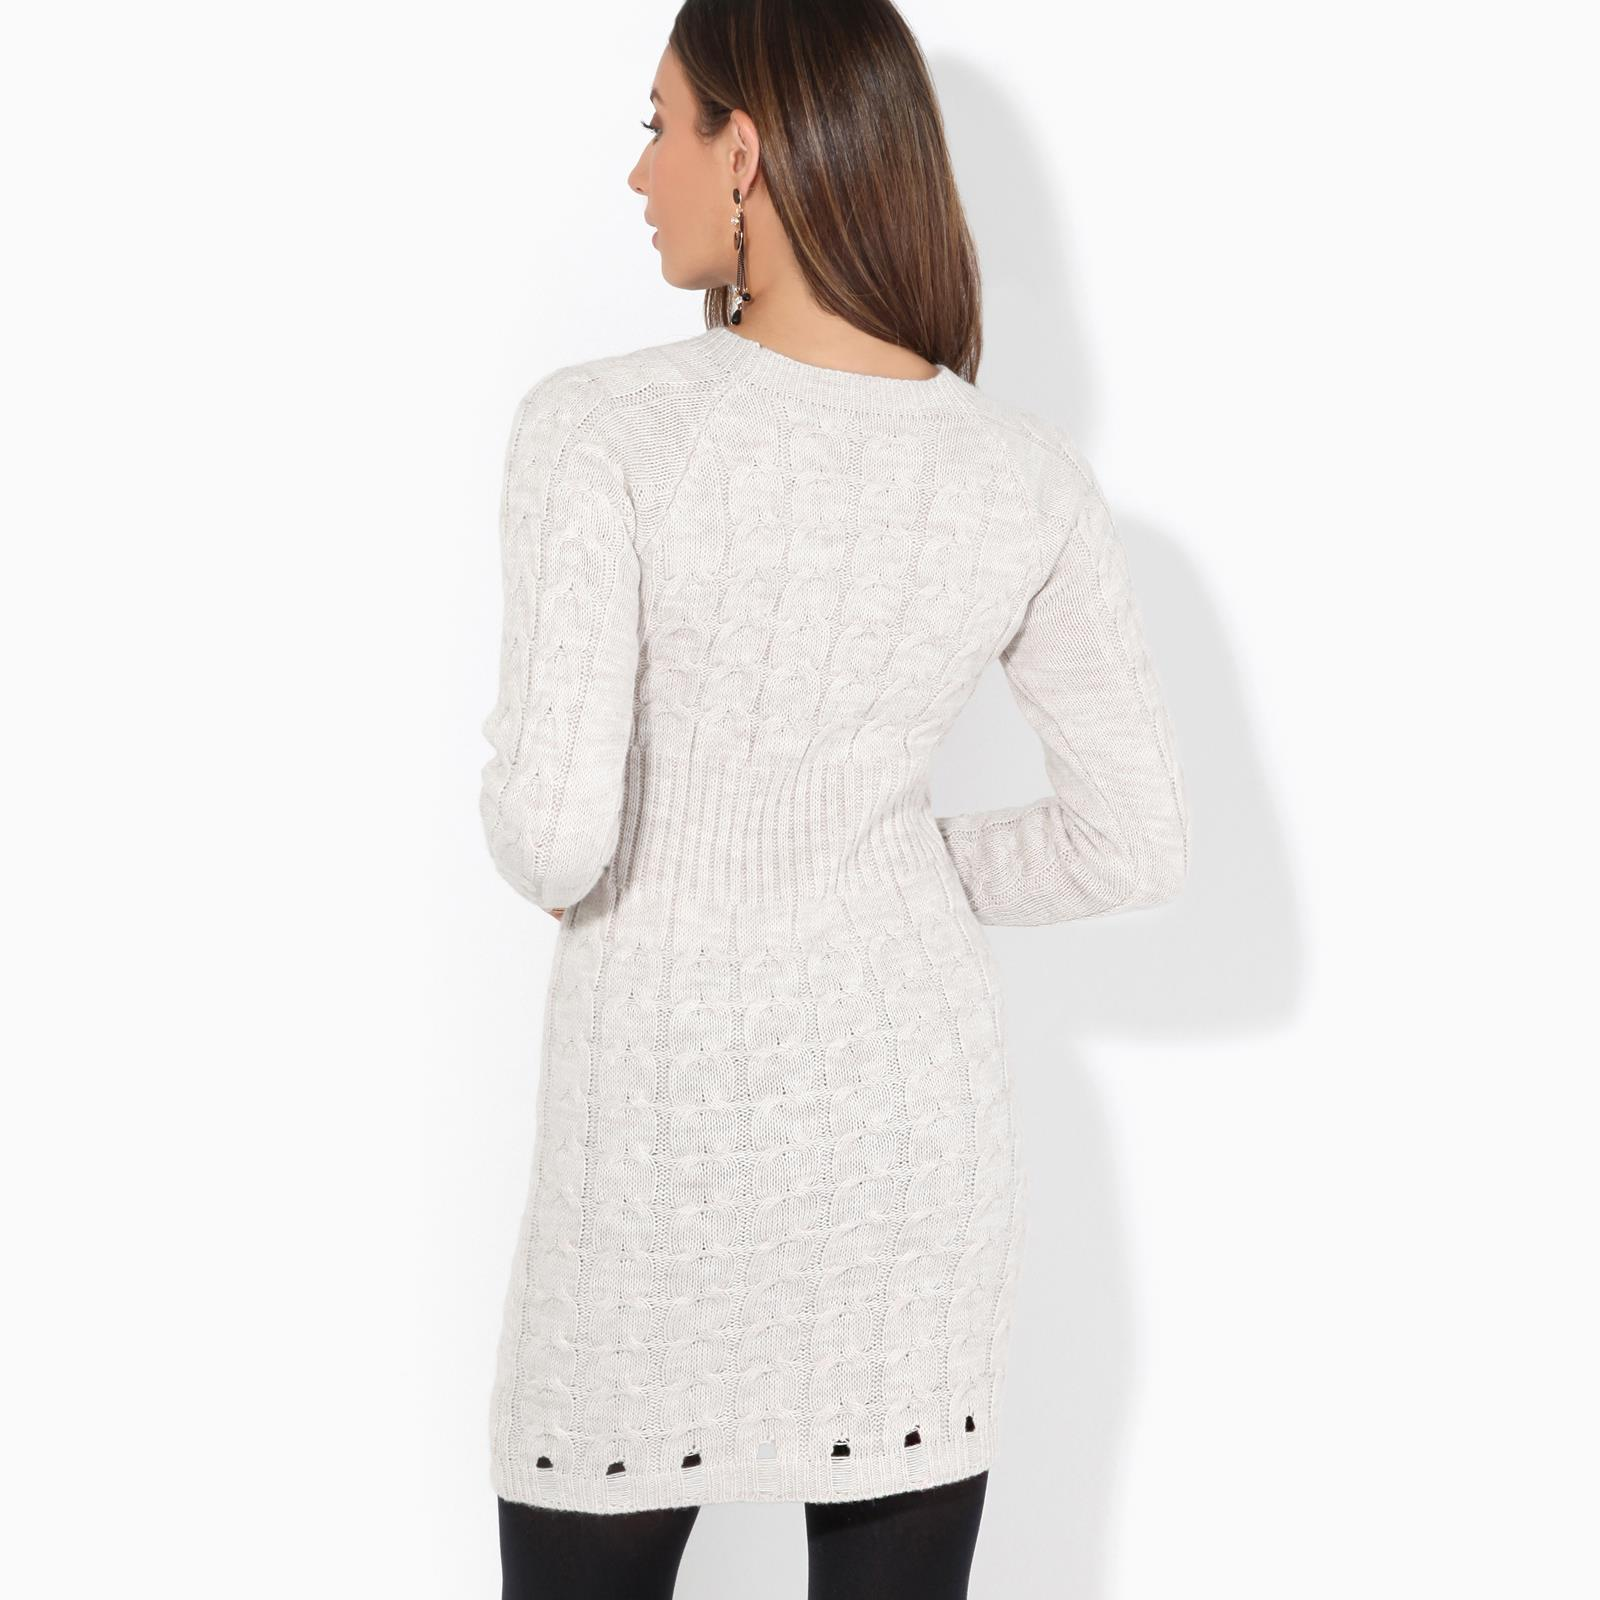 Womens-Ladies-Jumper-Dress-Longsleeve-Mini-Warm-Winter-Knit-Top-Bodycon thumbnail 4